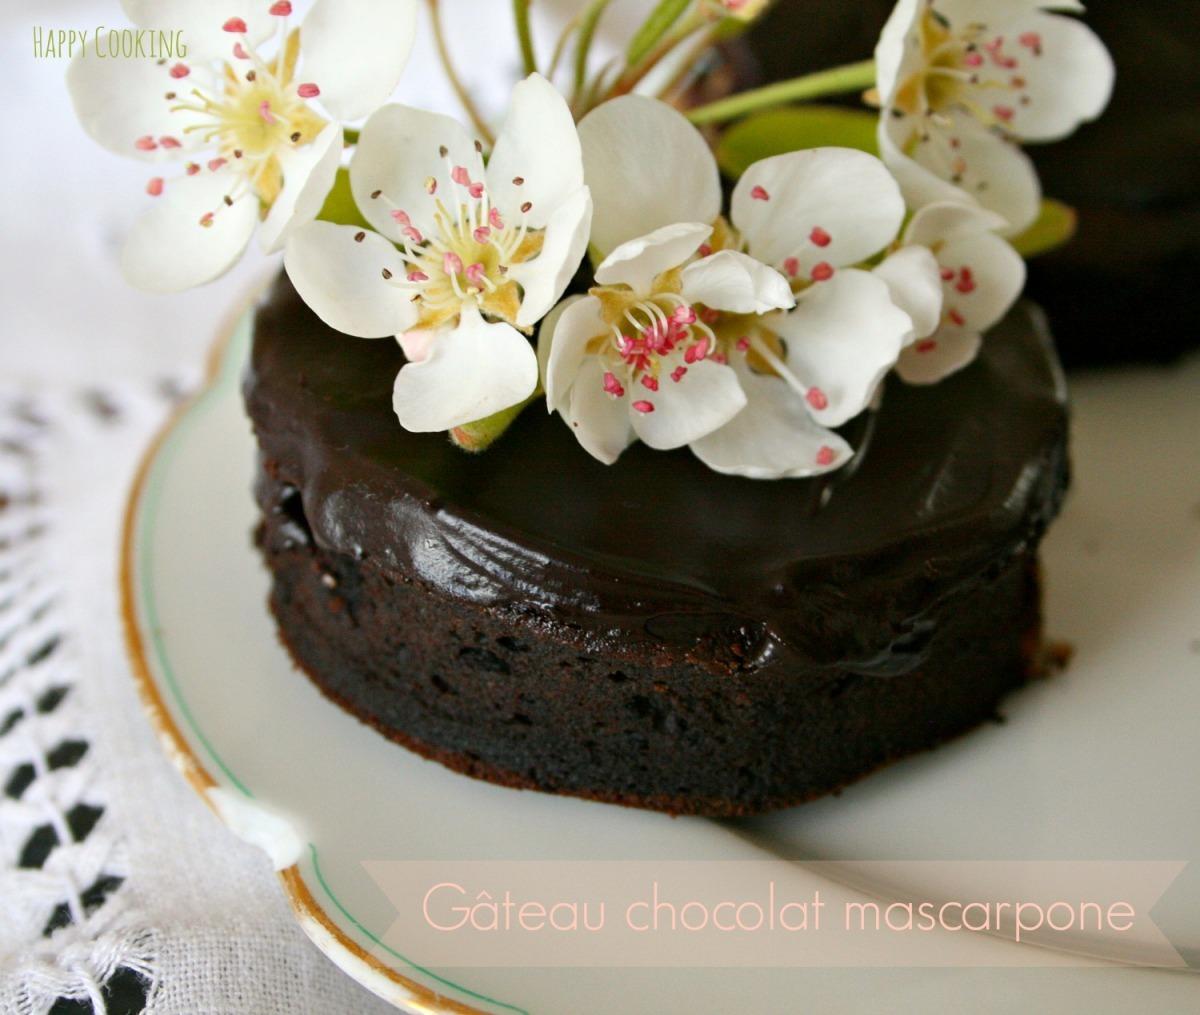 Gateau chocolat mascarpone